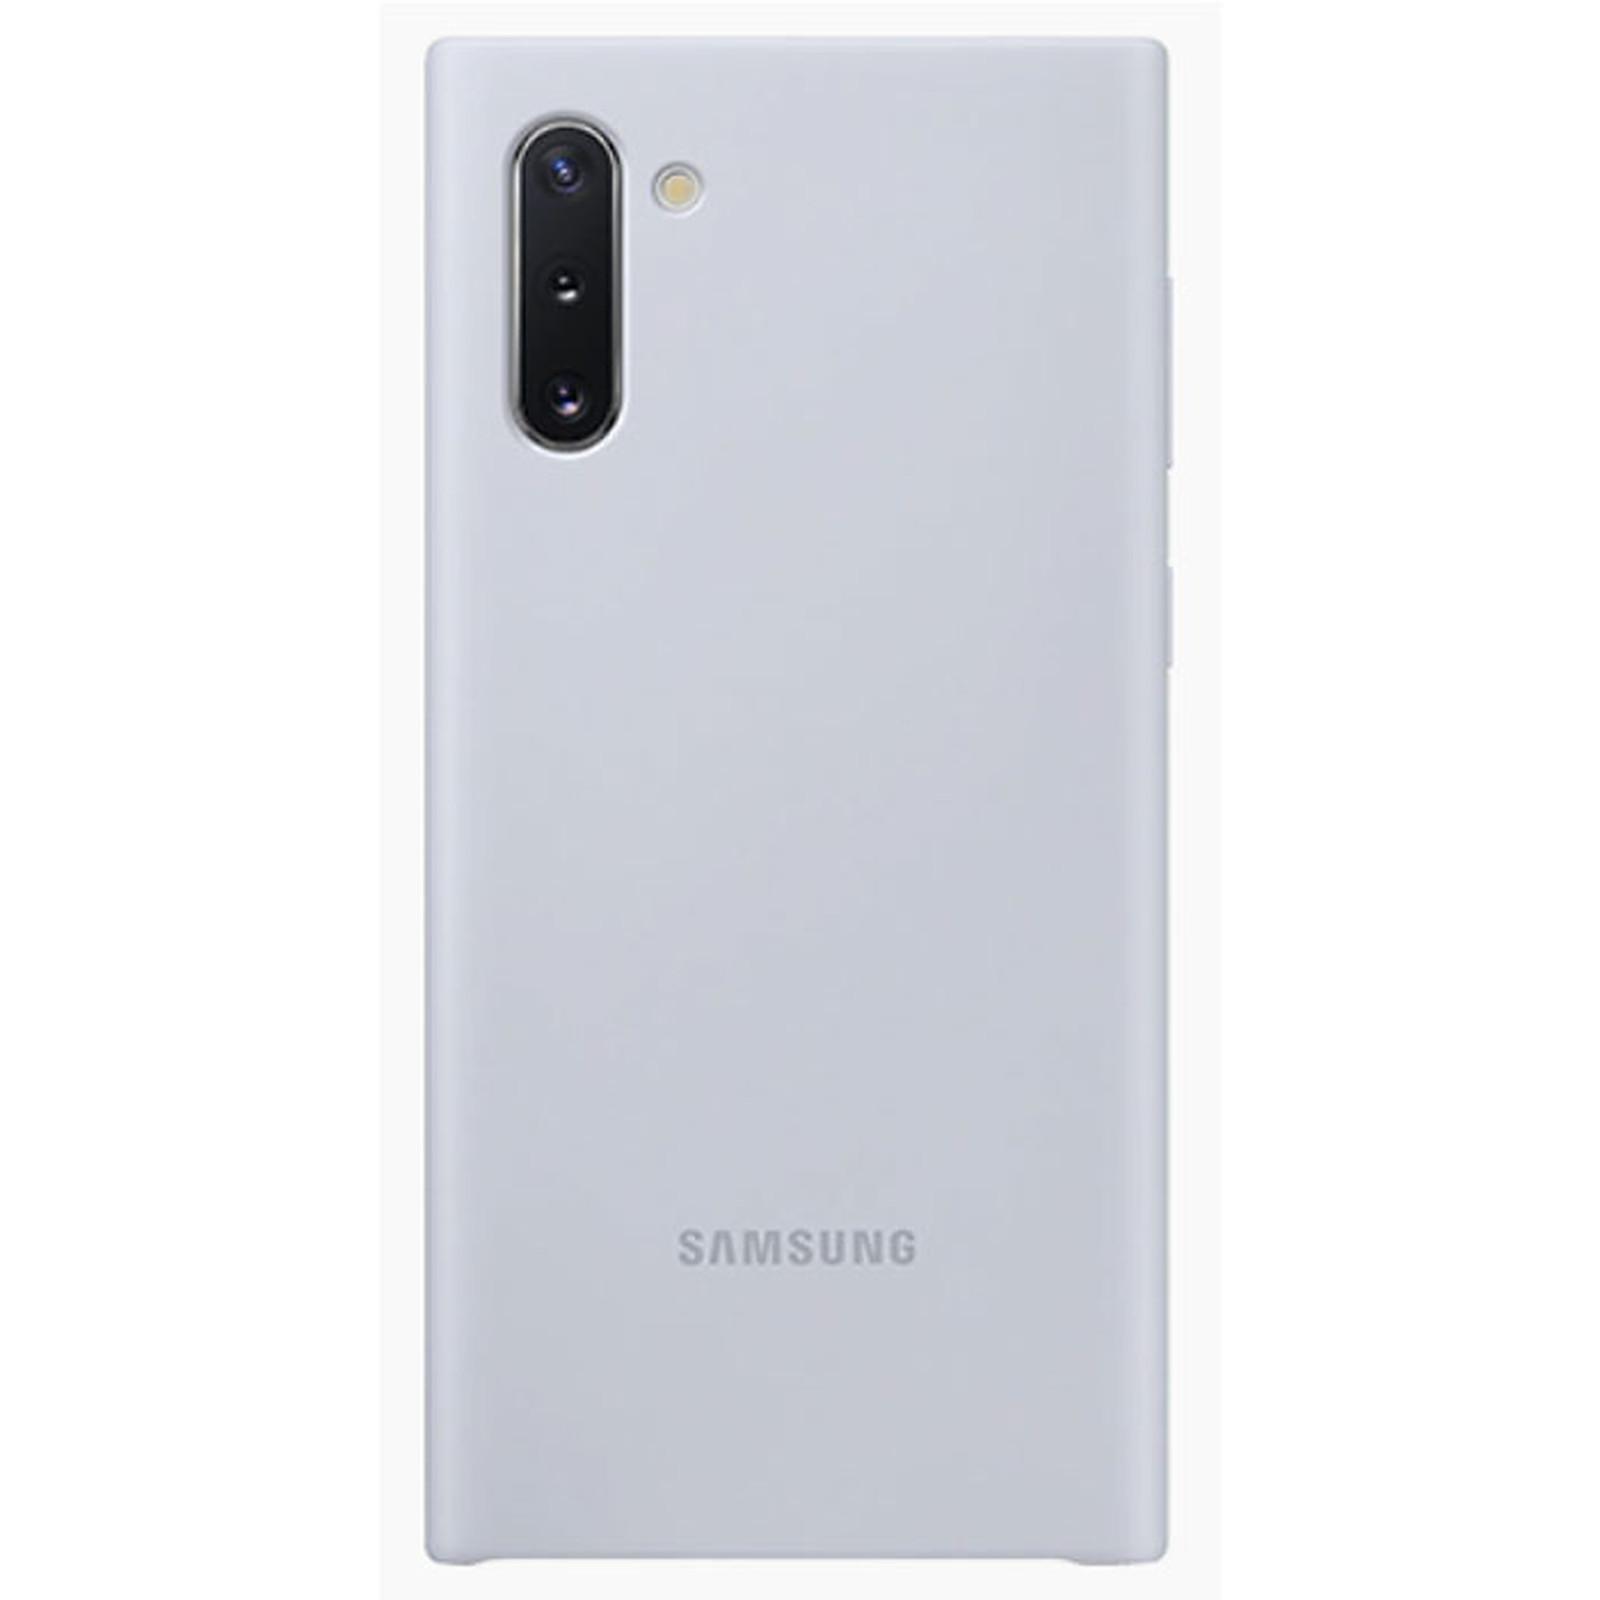 Samsung Coque Silicone Argent Galaxy Note 10